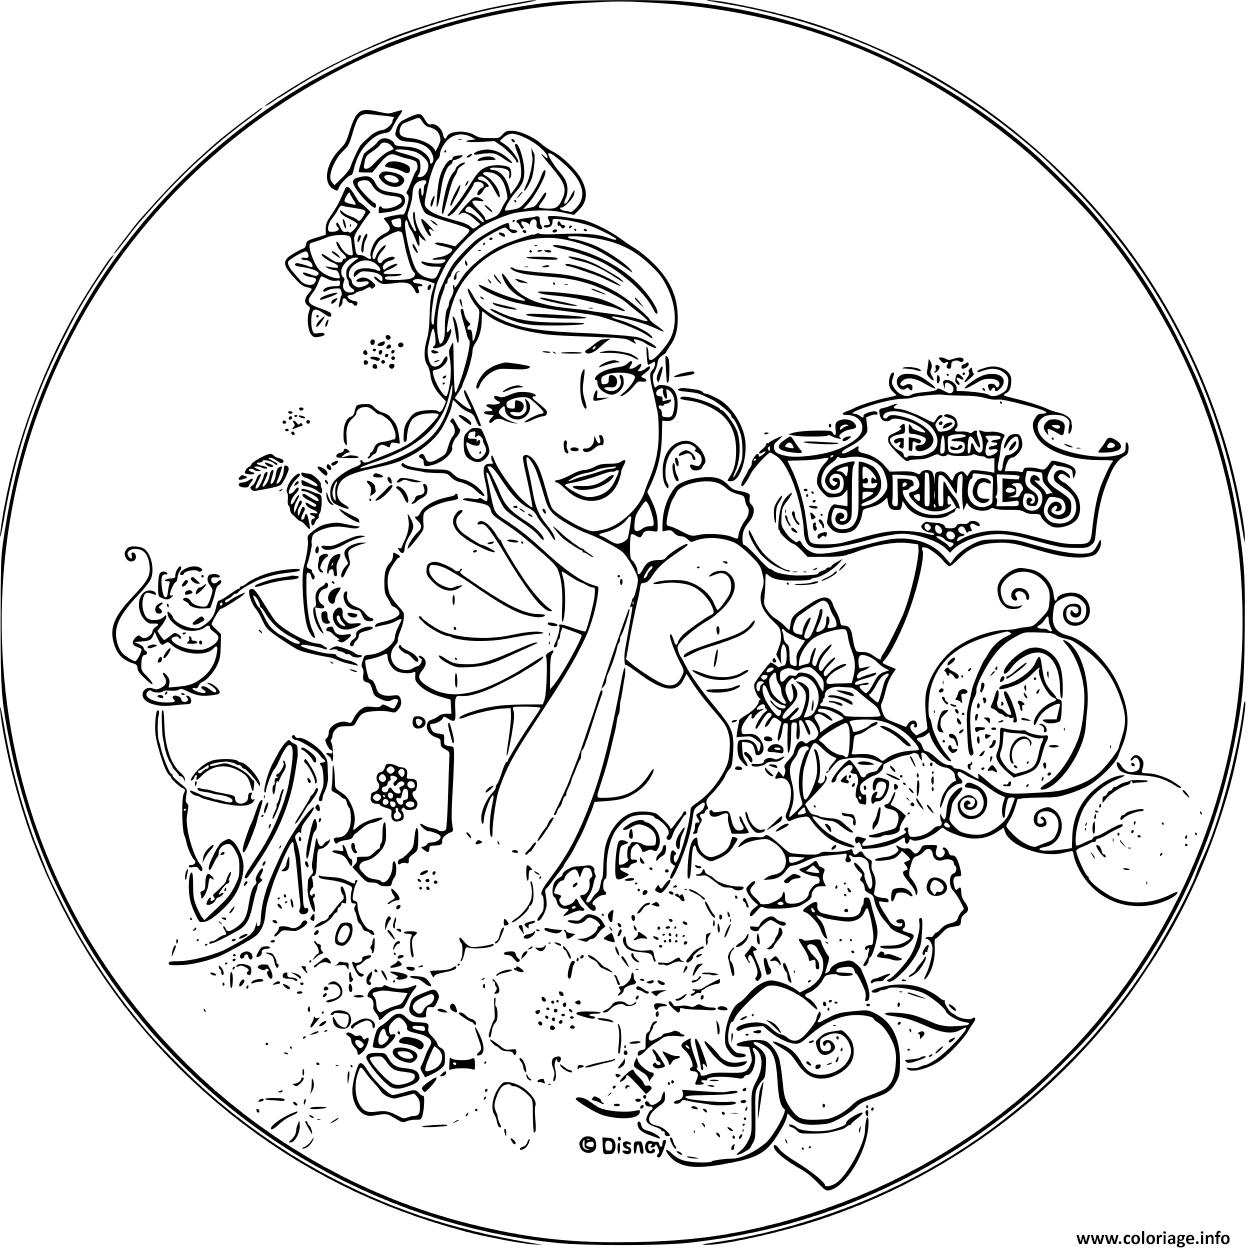 Coloriage Disney Princesse Cendrillon 1950 Jecolorie Com